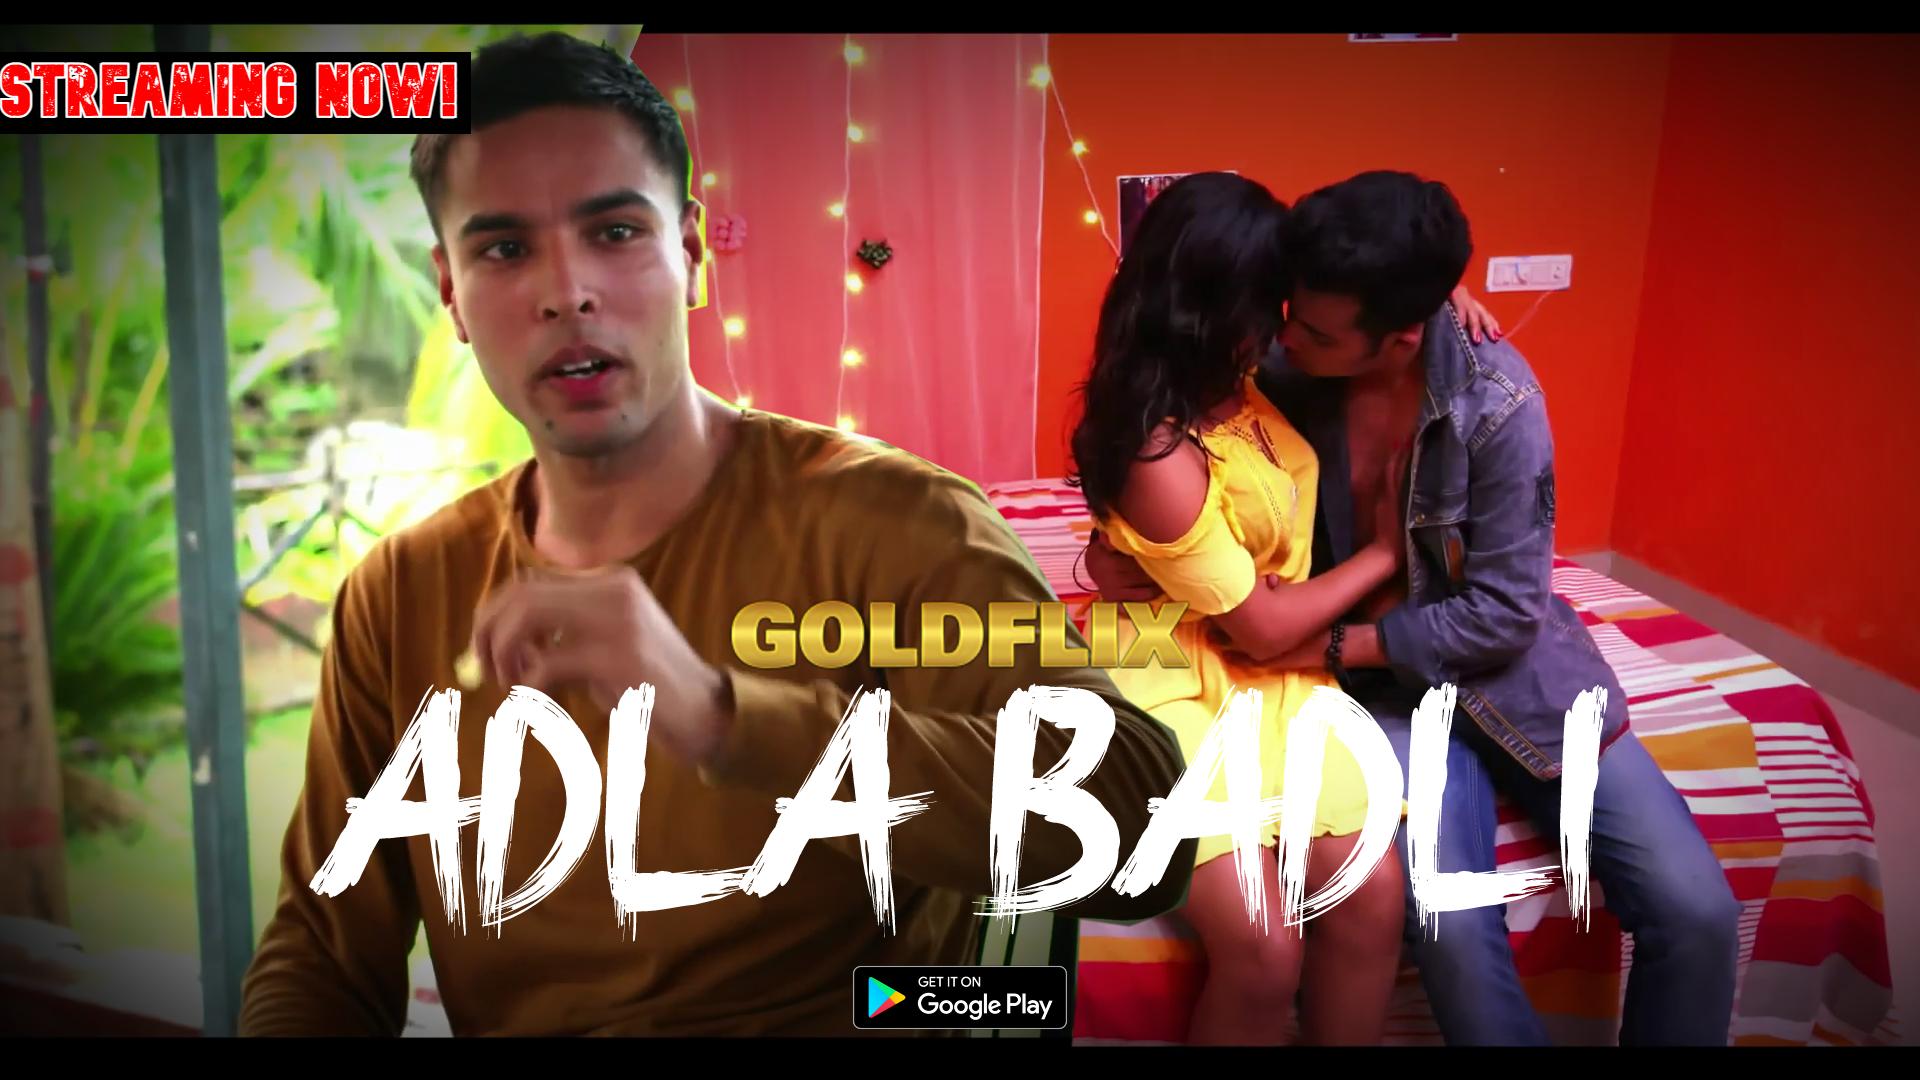 Download Adla Badli 2021 S01E01 GoldFlix Original Hindi Web Series 720p HDRip 210MB